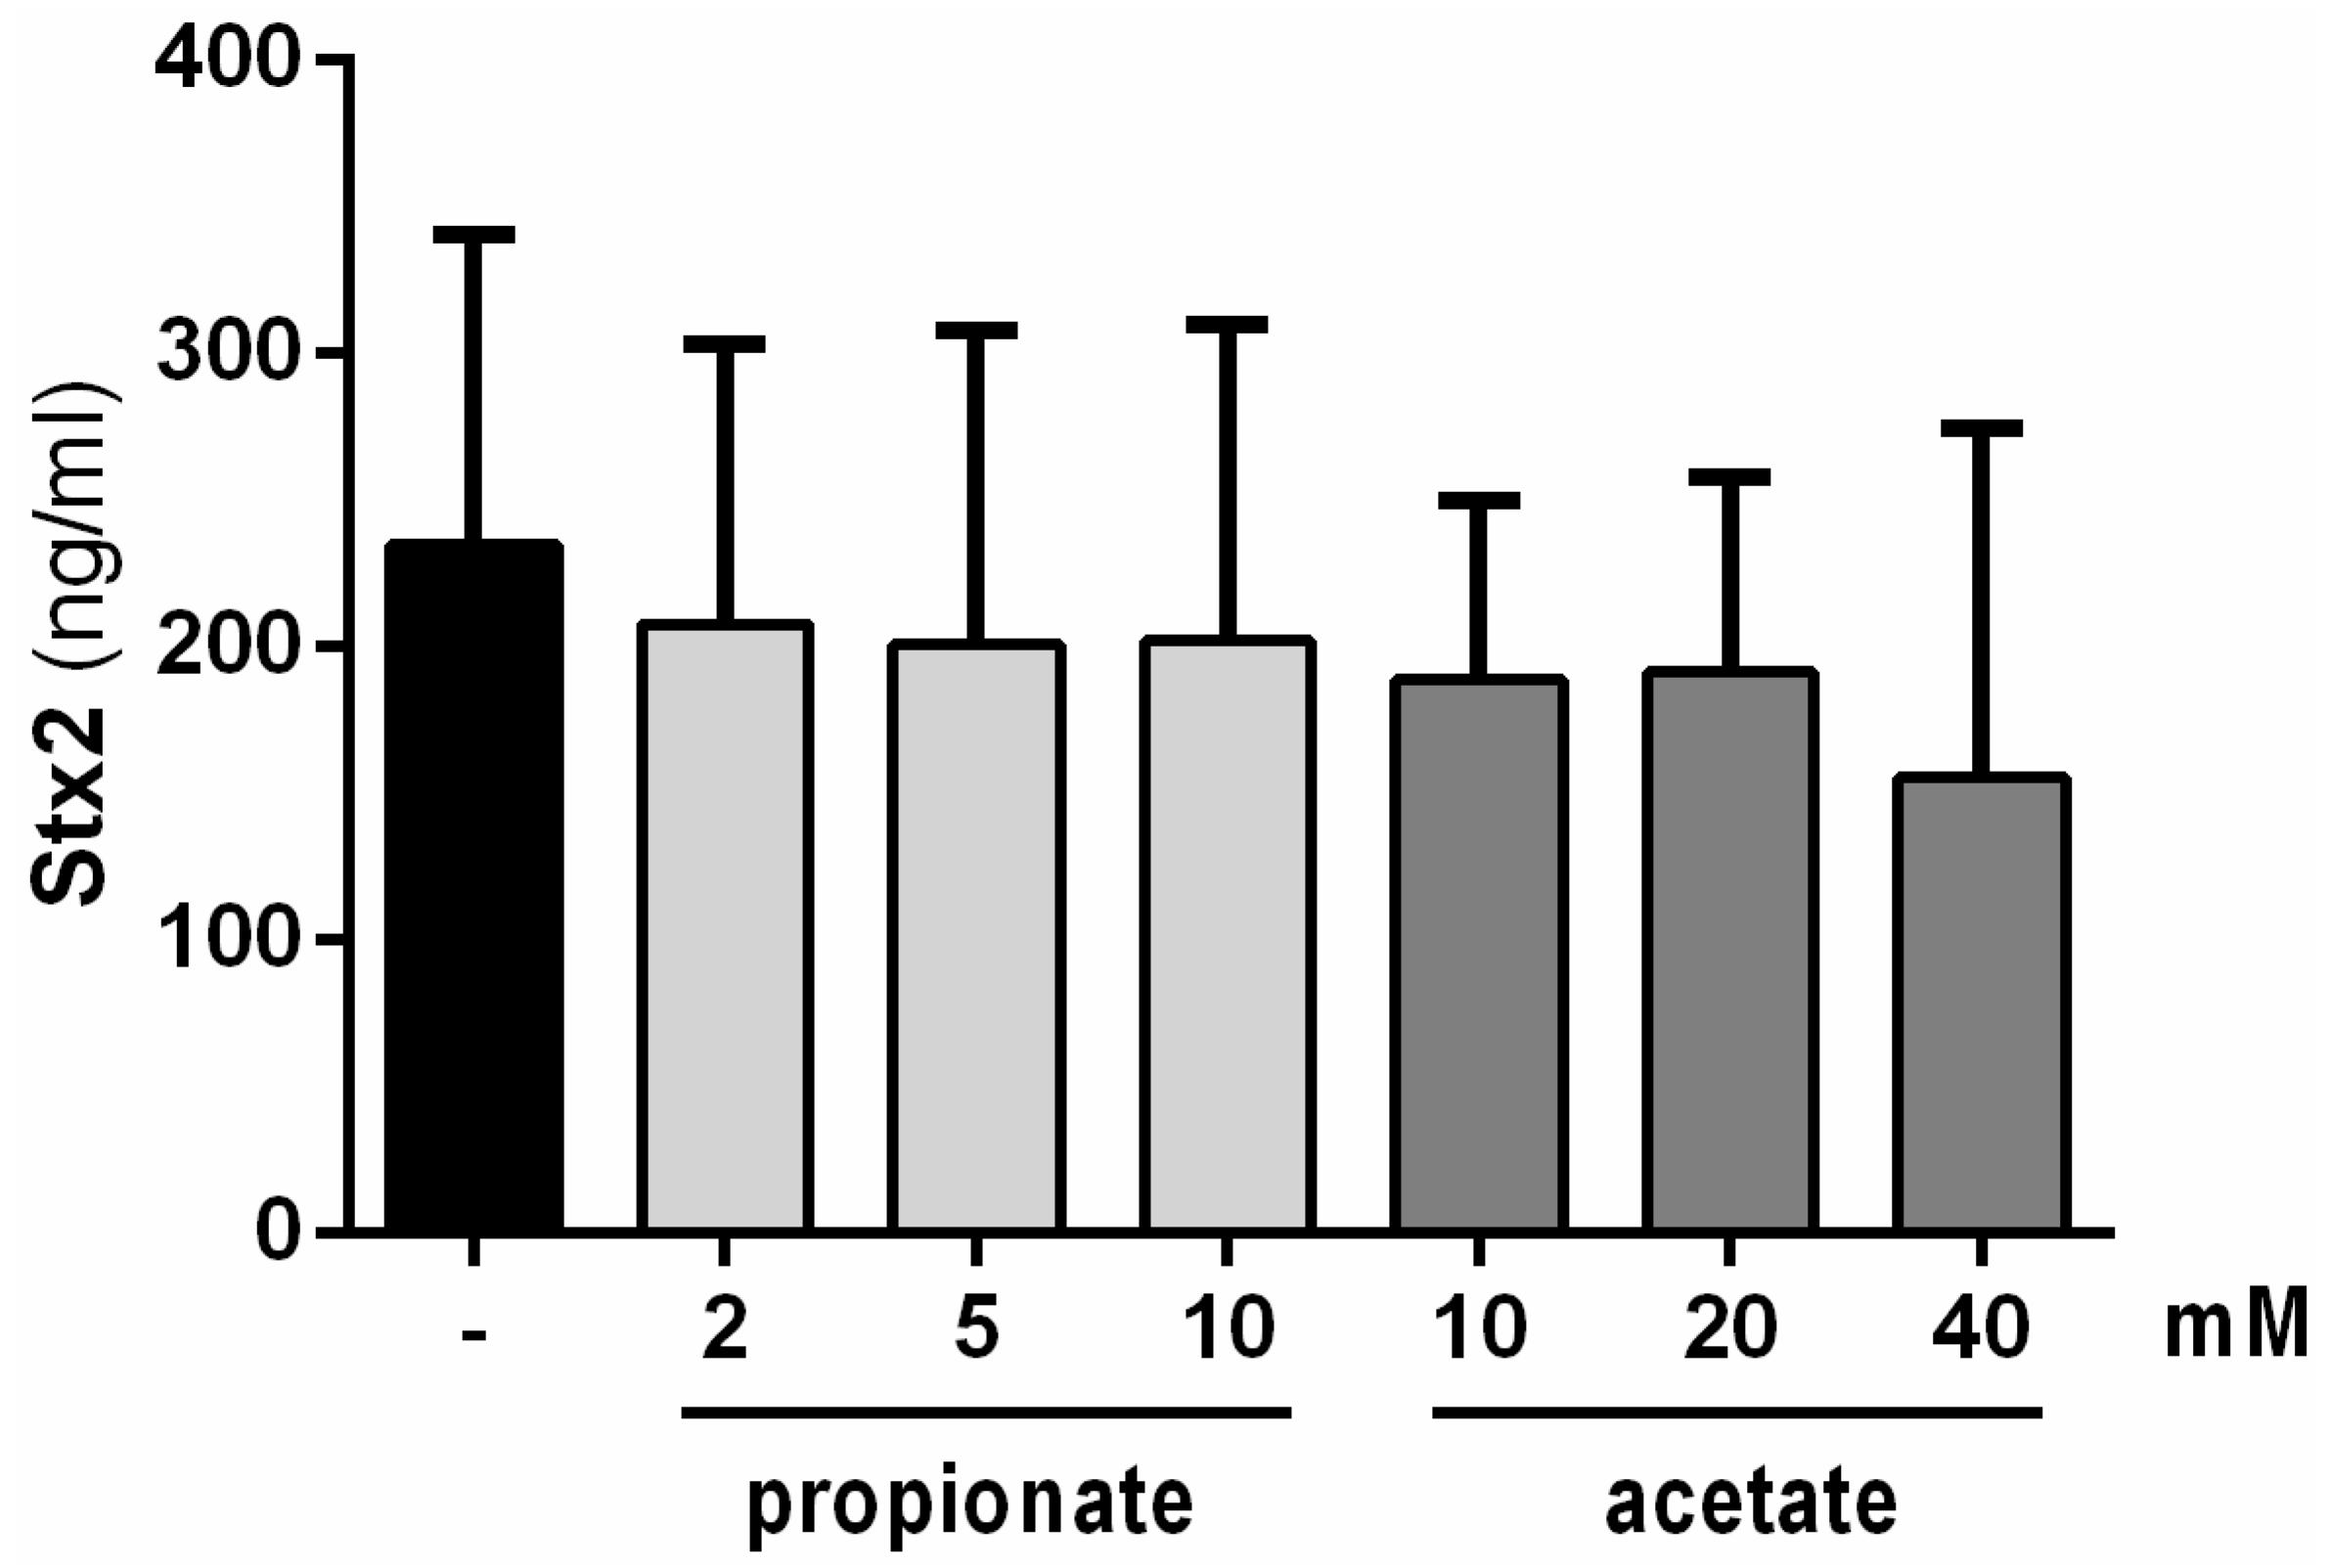 propionate regulates lymphocyte proliferation and metabolism